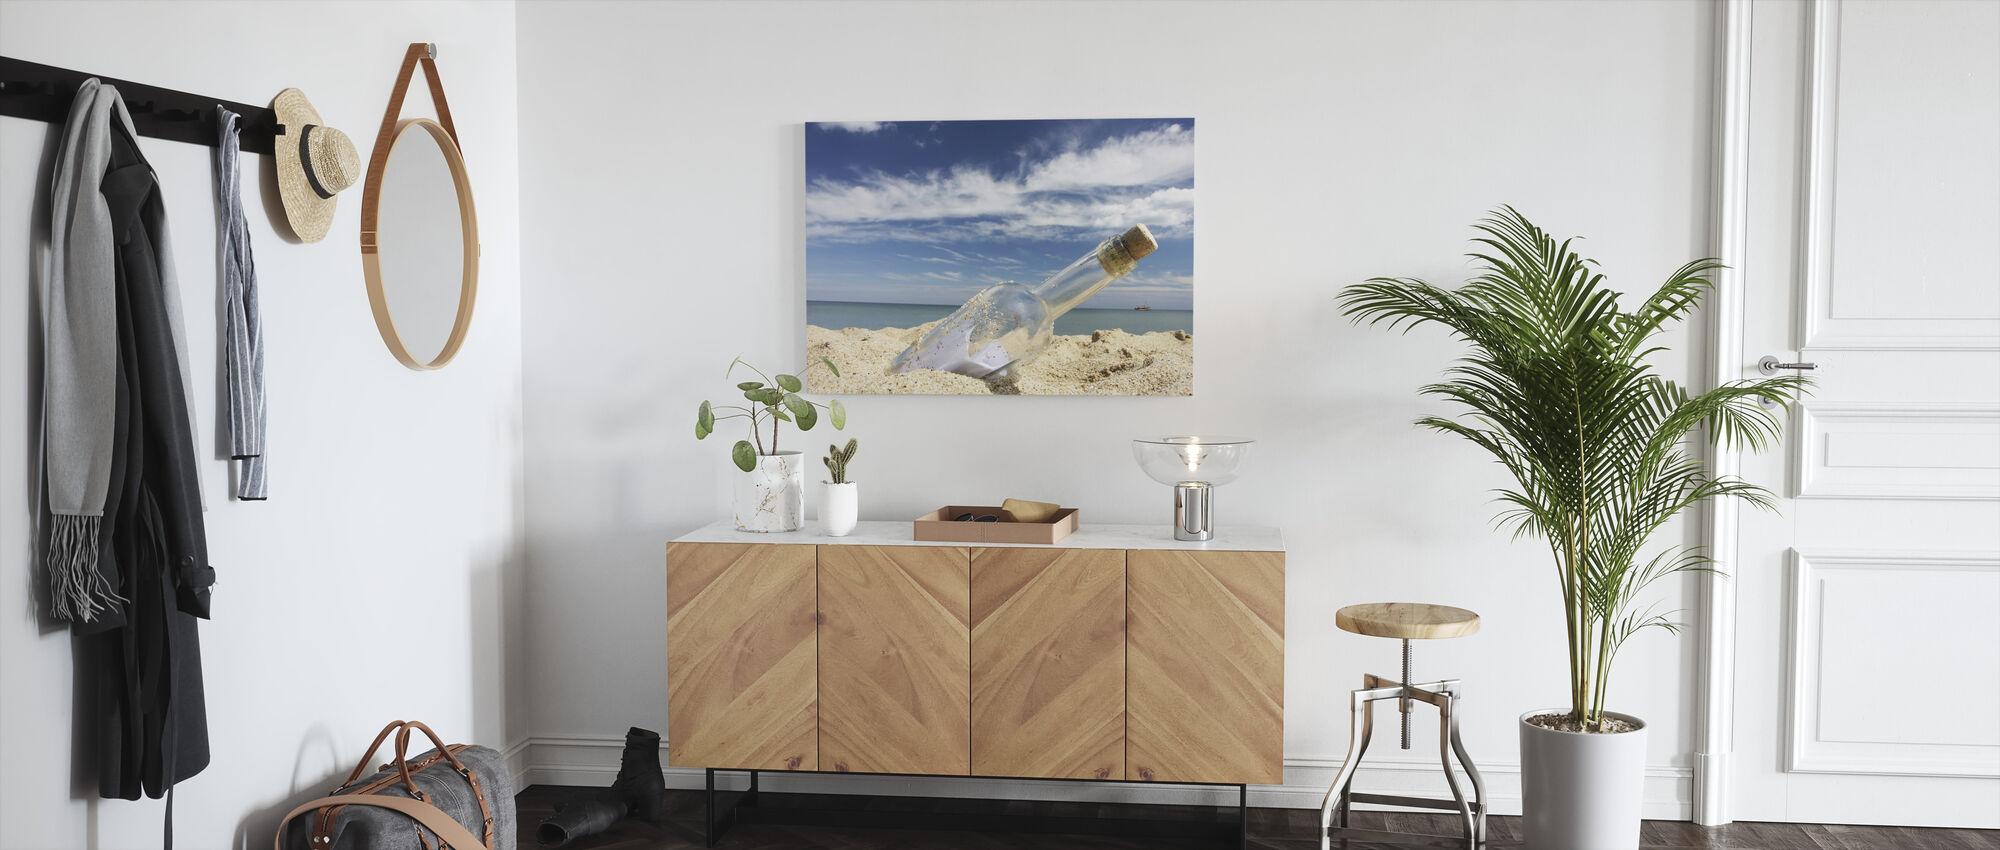 Washed Ashore - Canvas print - Hallway